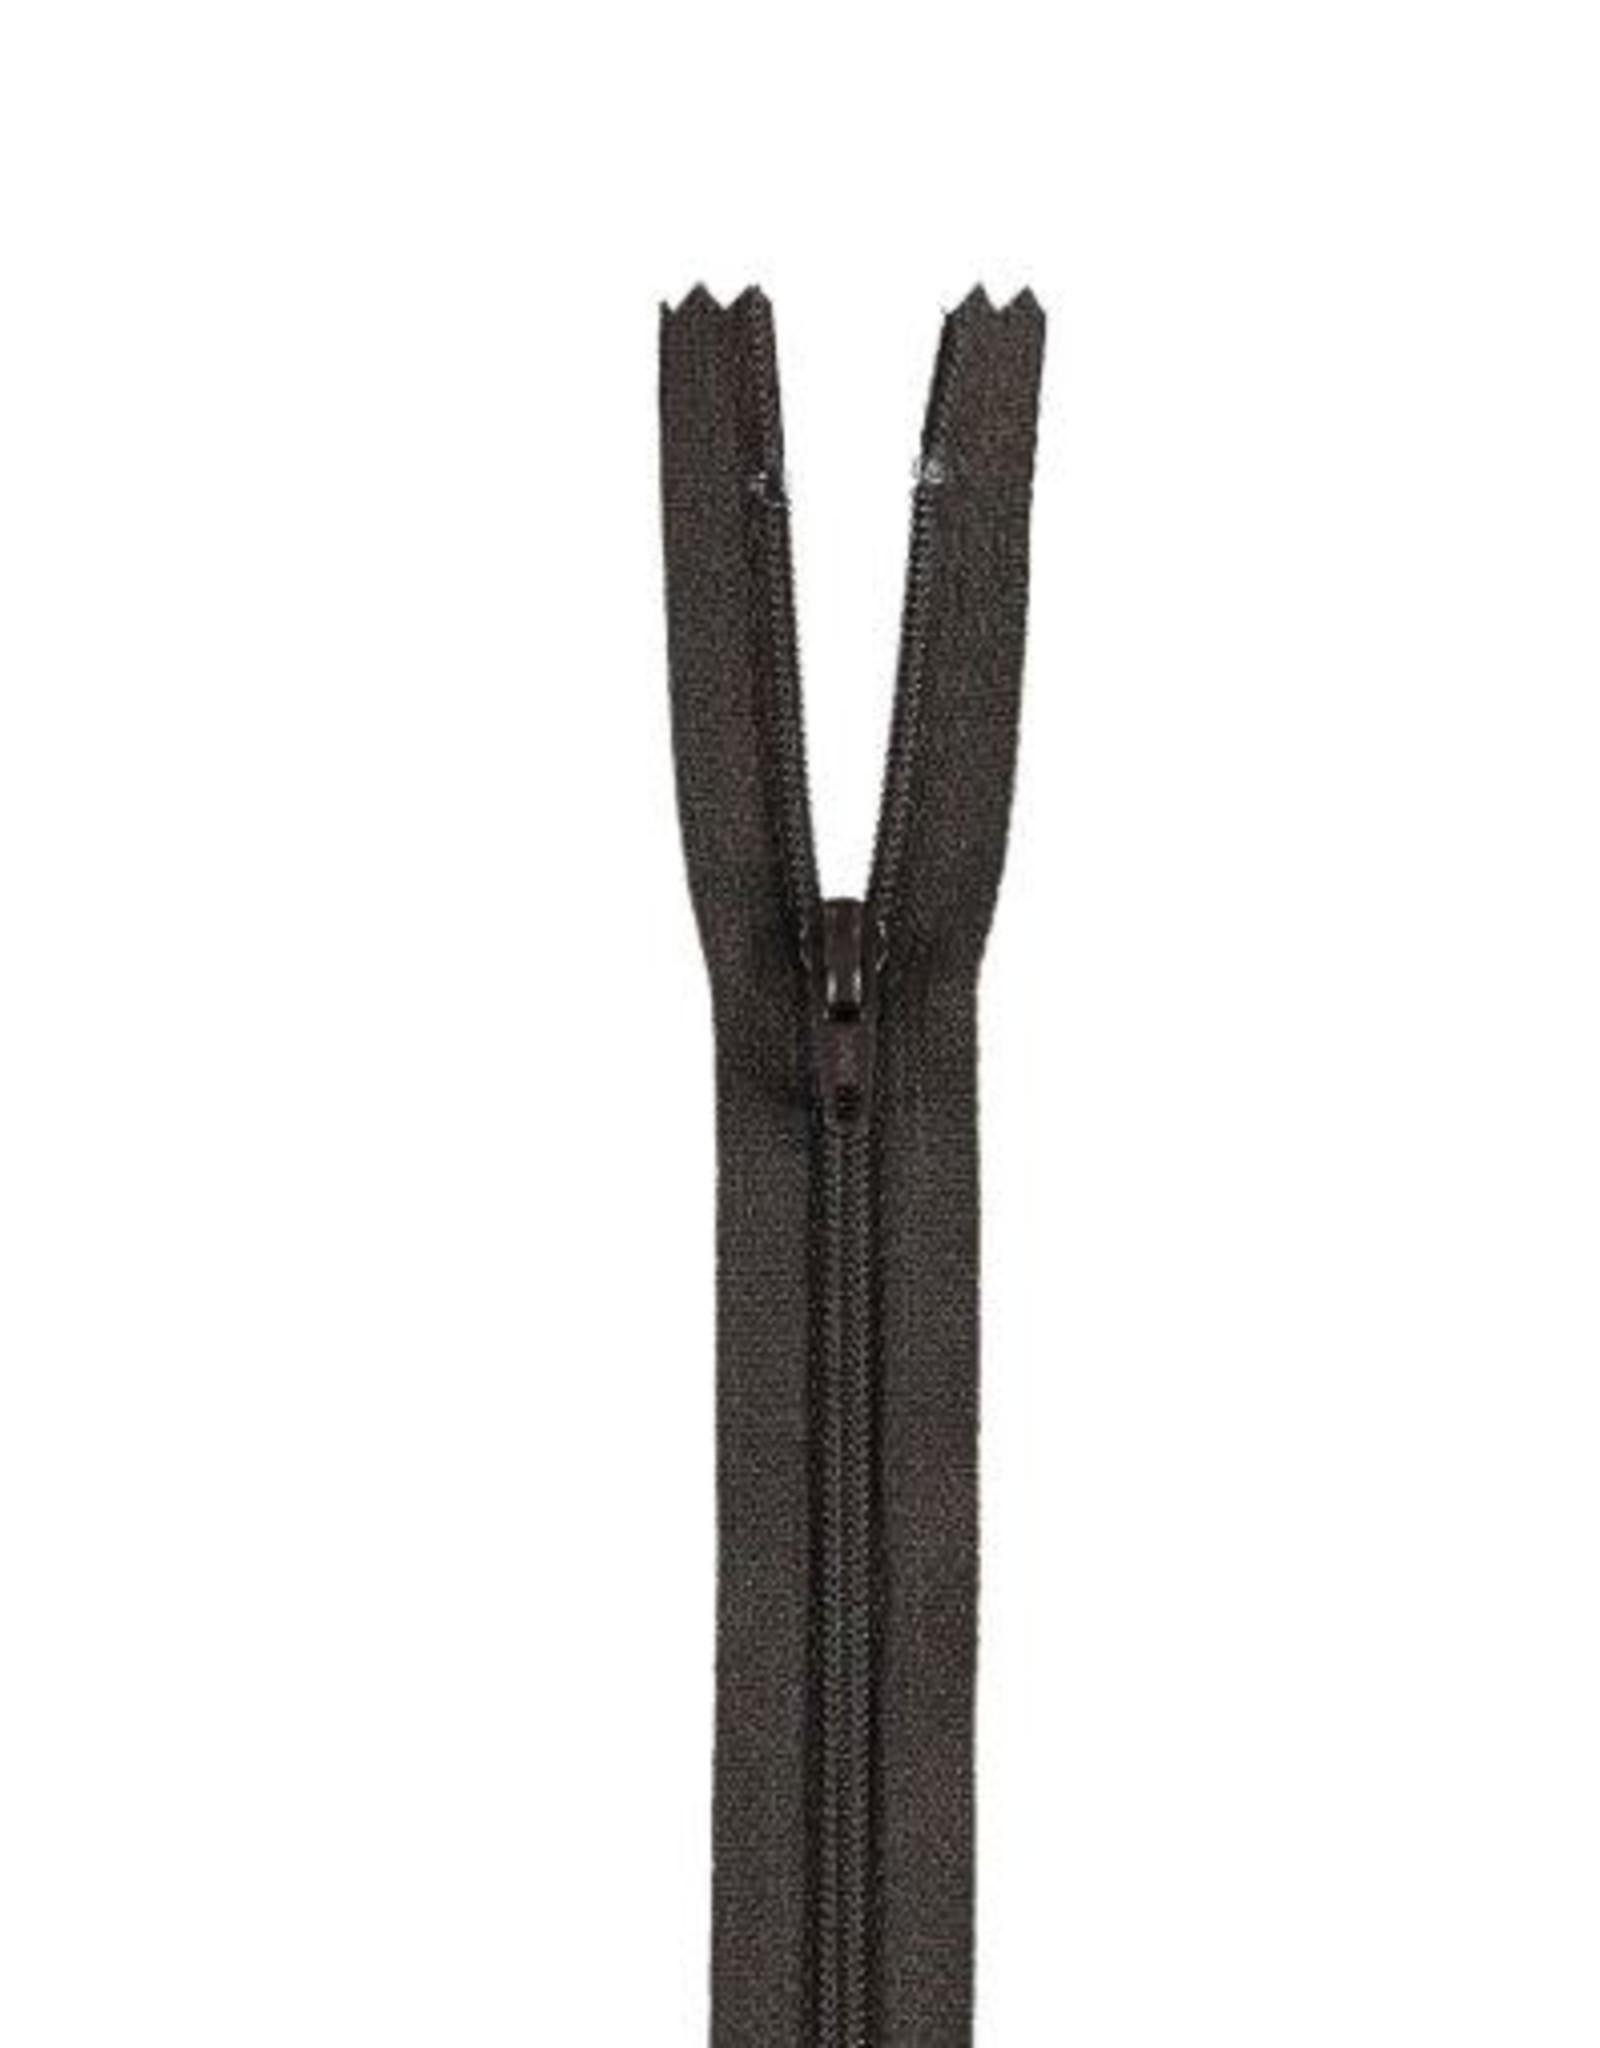 YKK Spiraalrits niet-DB 3mm zwart bruin 916-55cm